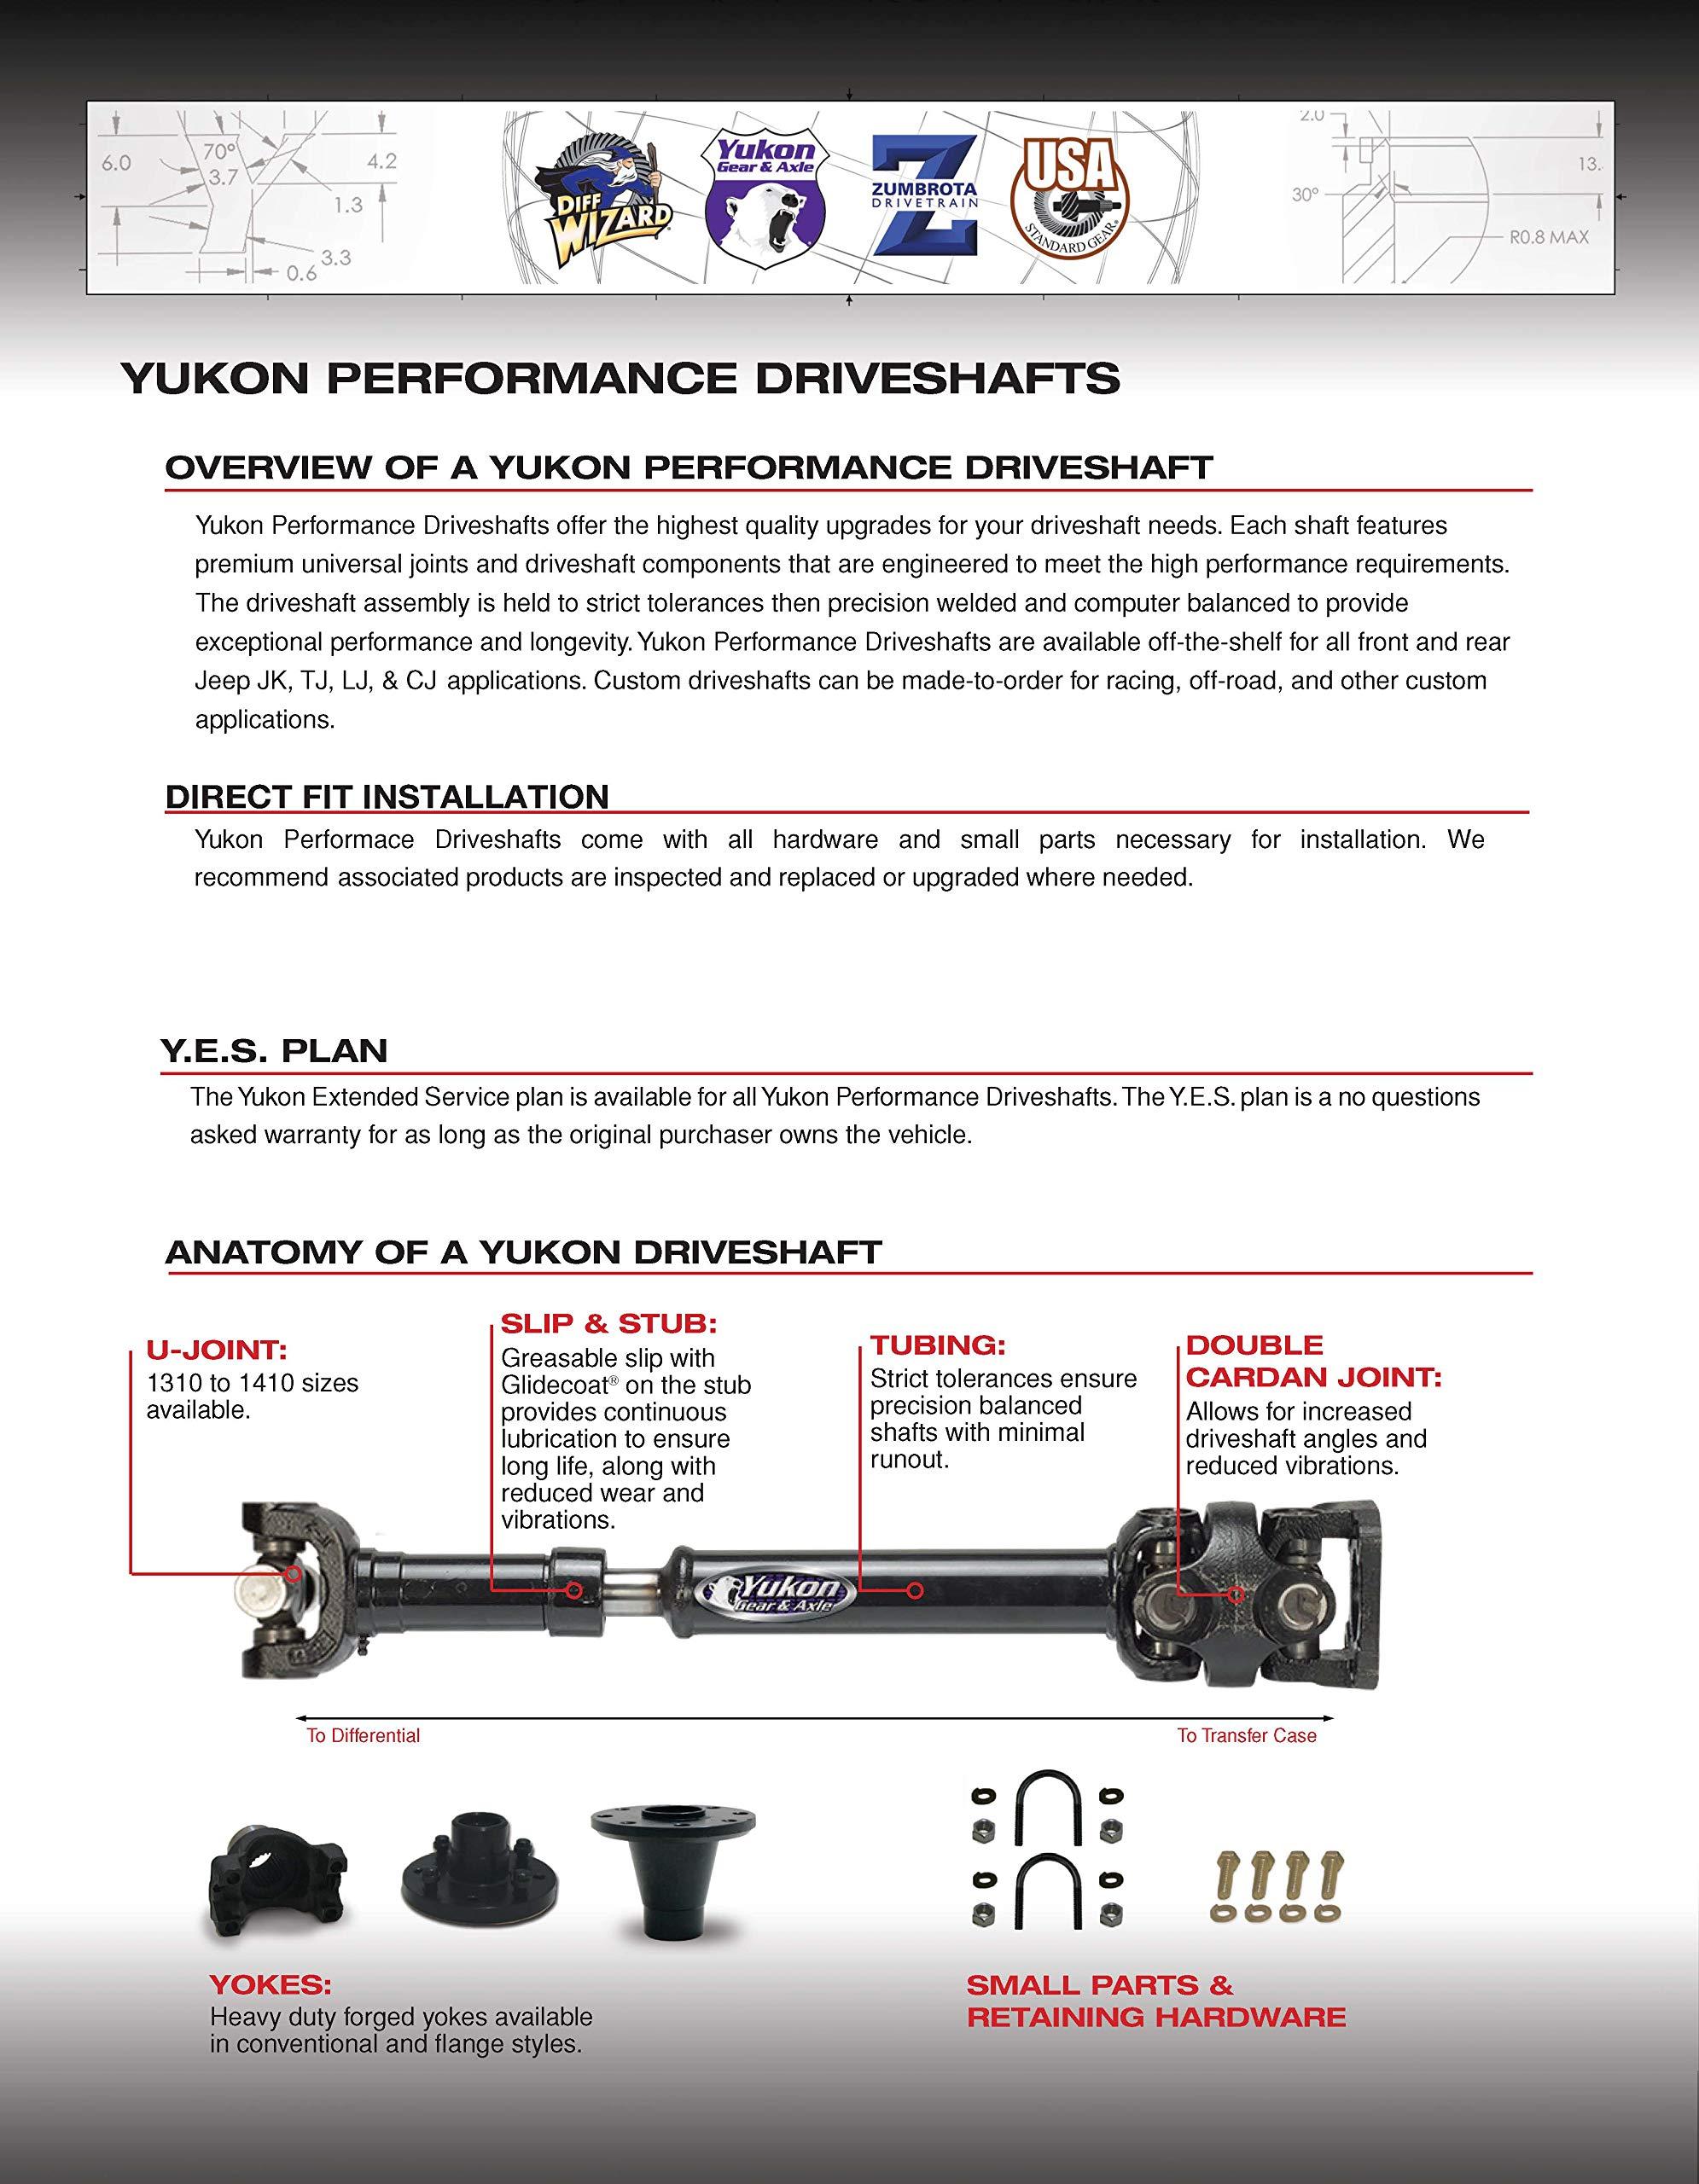 Yukon Gear /& Axle YG GM8.25-342R High Performance Ring /& Pinion Gear Set for GM 8.25 IFS Reverse Rotation Differential